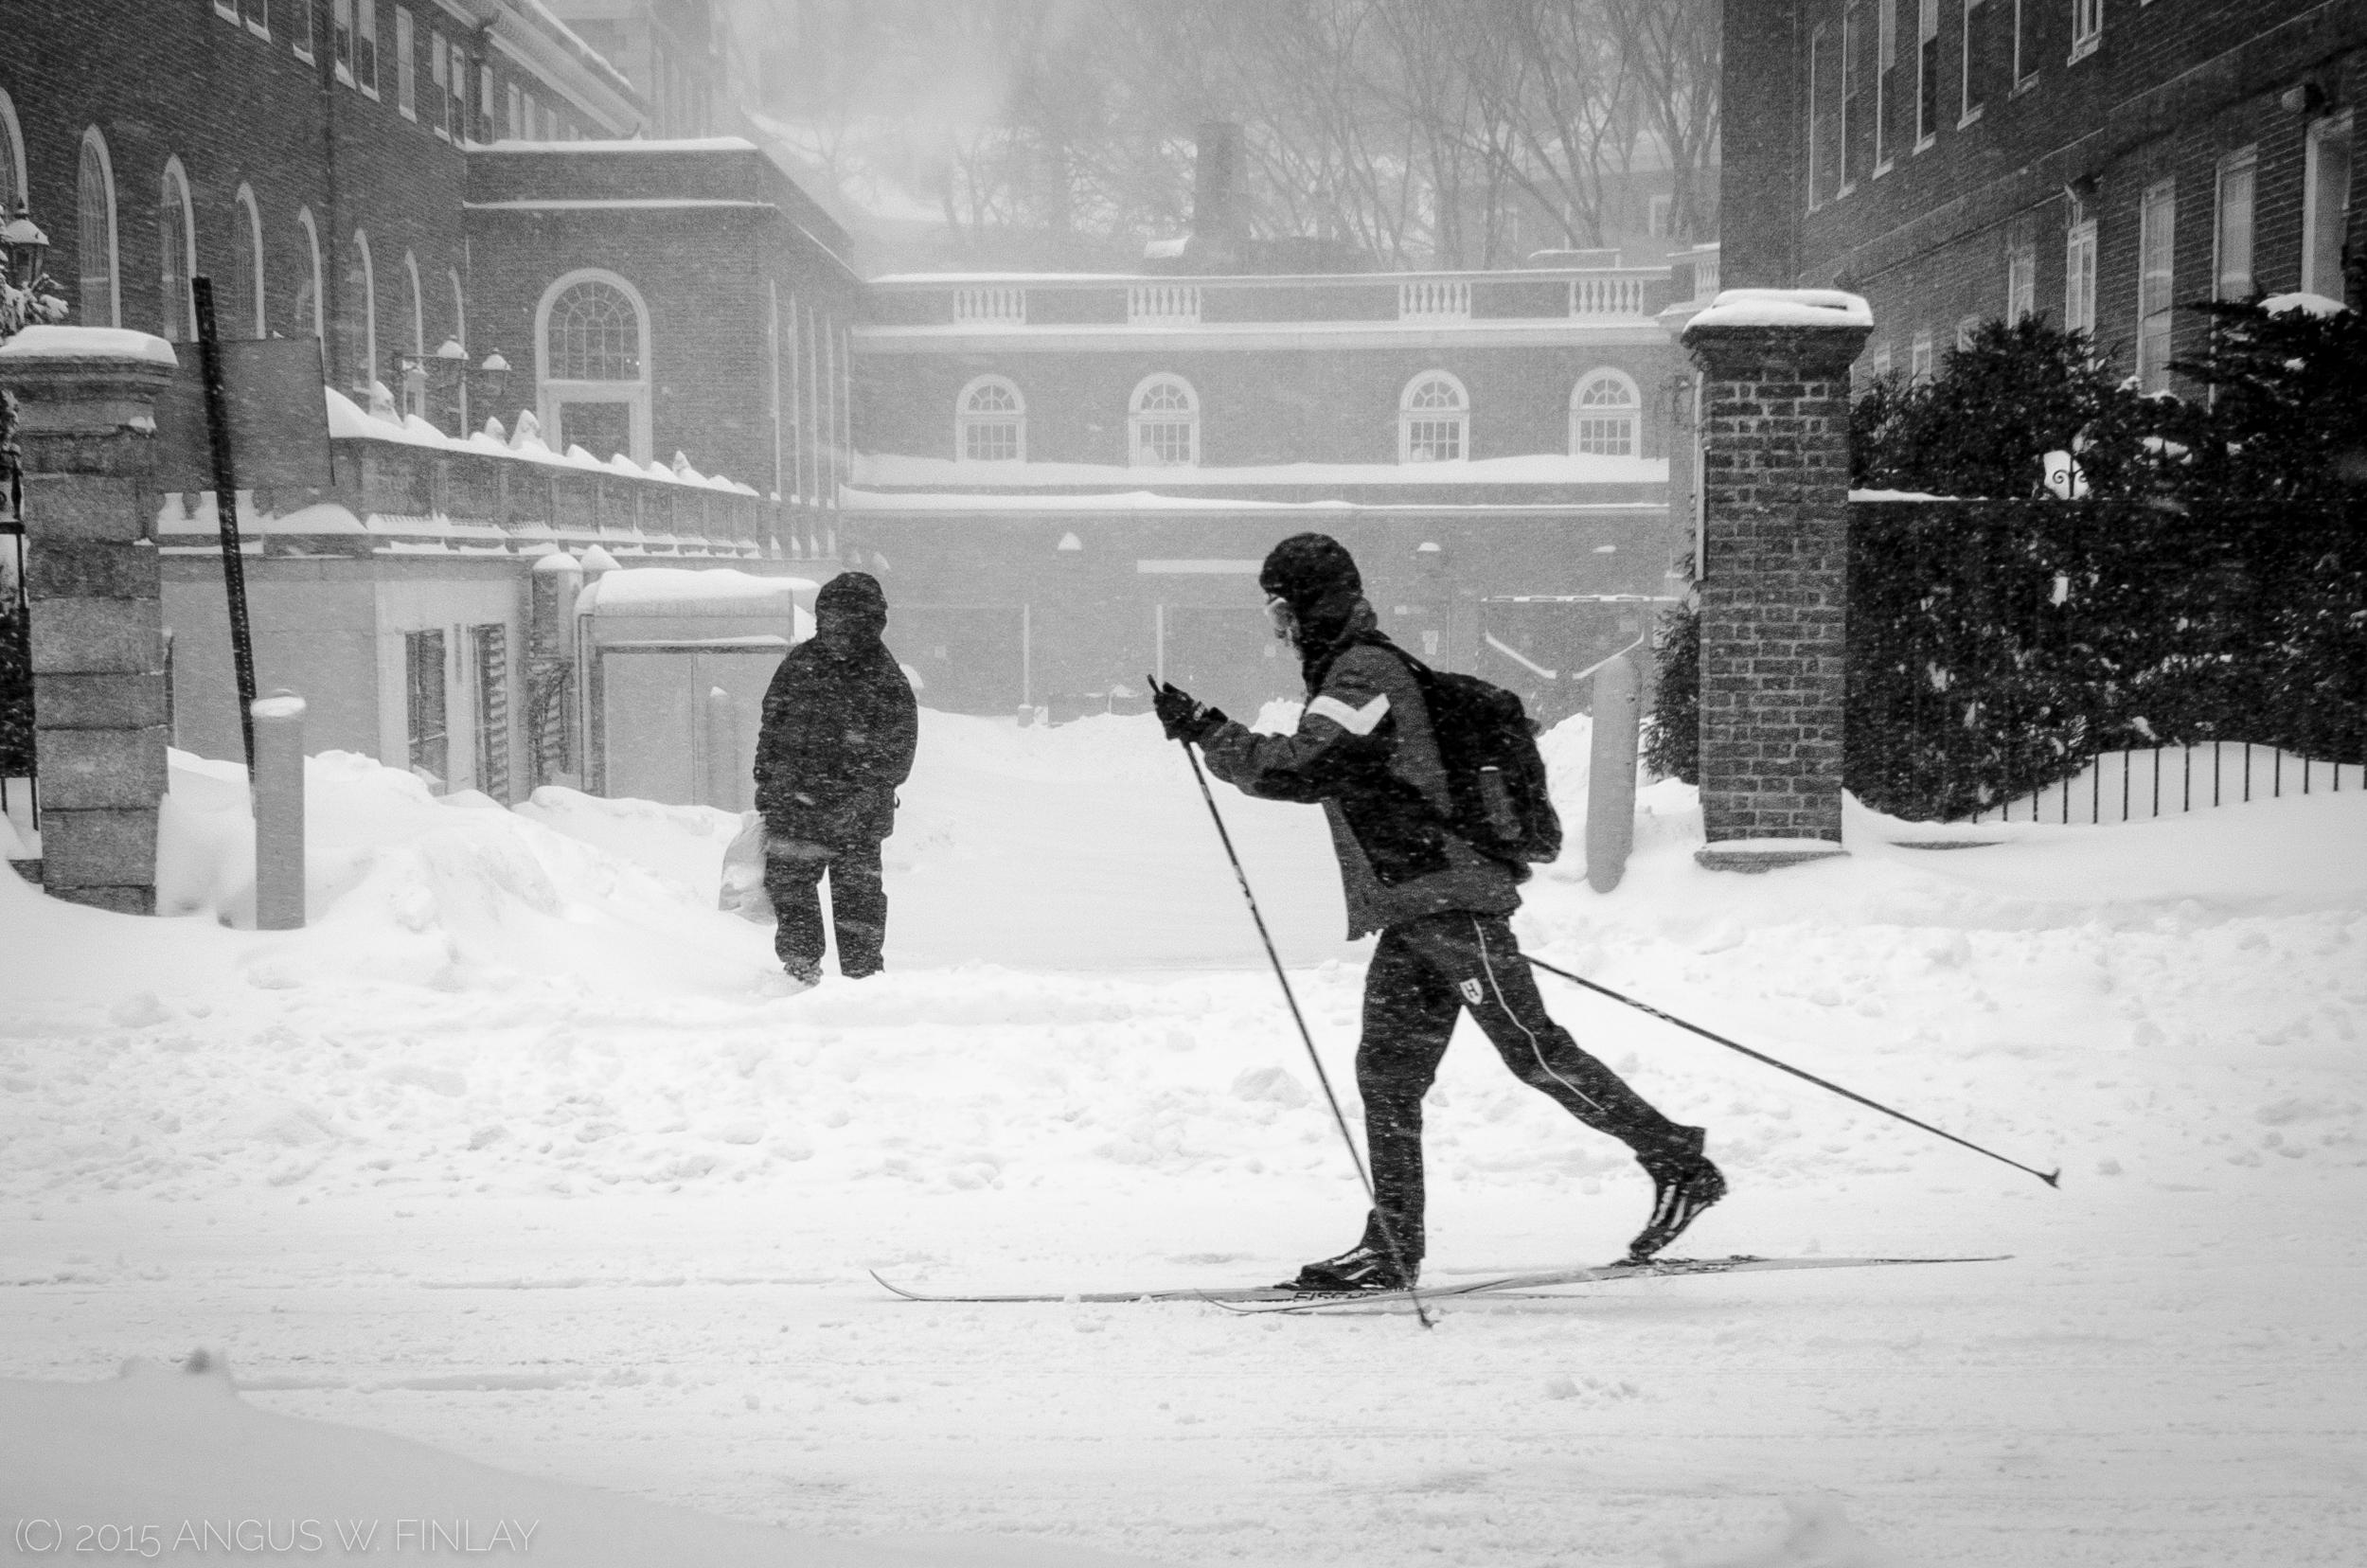 Skier Commute